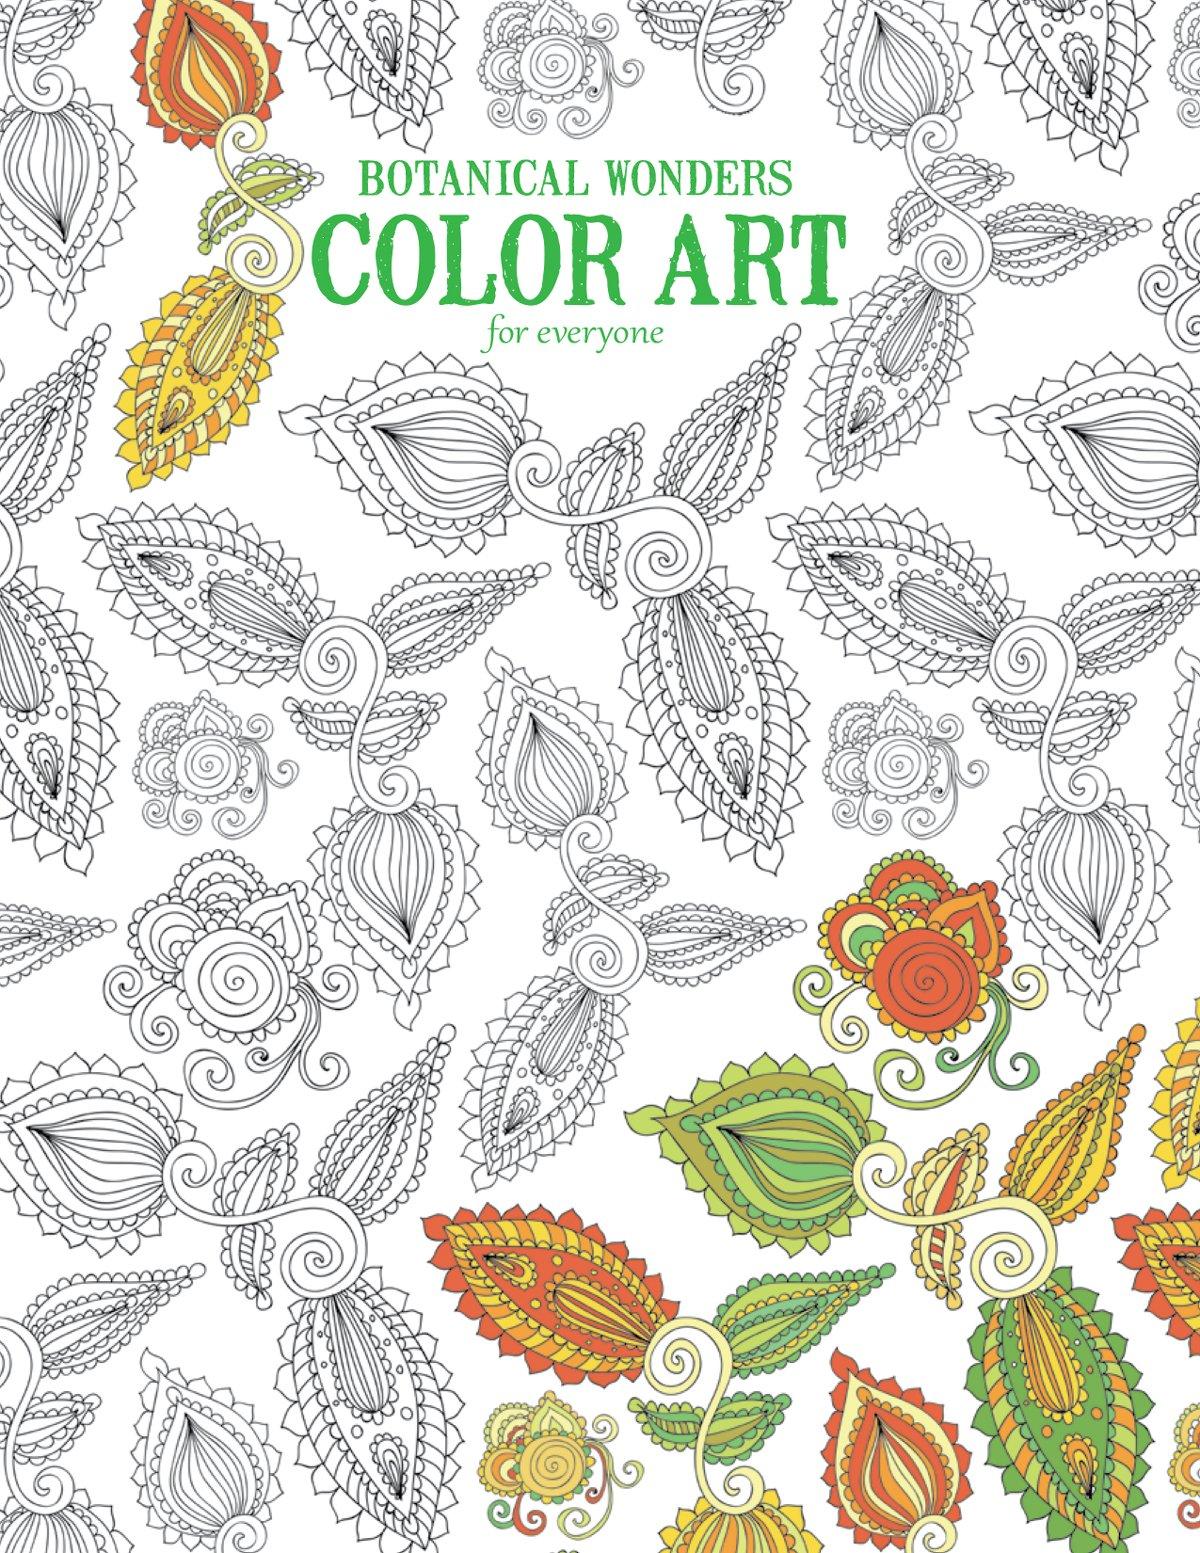 Botanical art coloring book - Amazon Com Botanical Wonders Color Art For Everyone Leisure Arts 6764 9781464754074 Leisure Arts The Guild Of Master Craftsman Publications Ltd